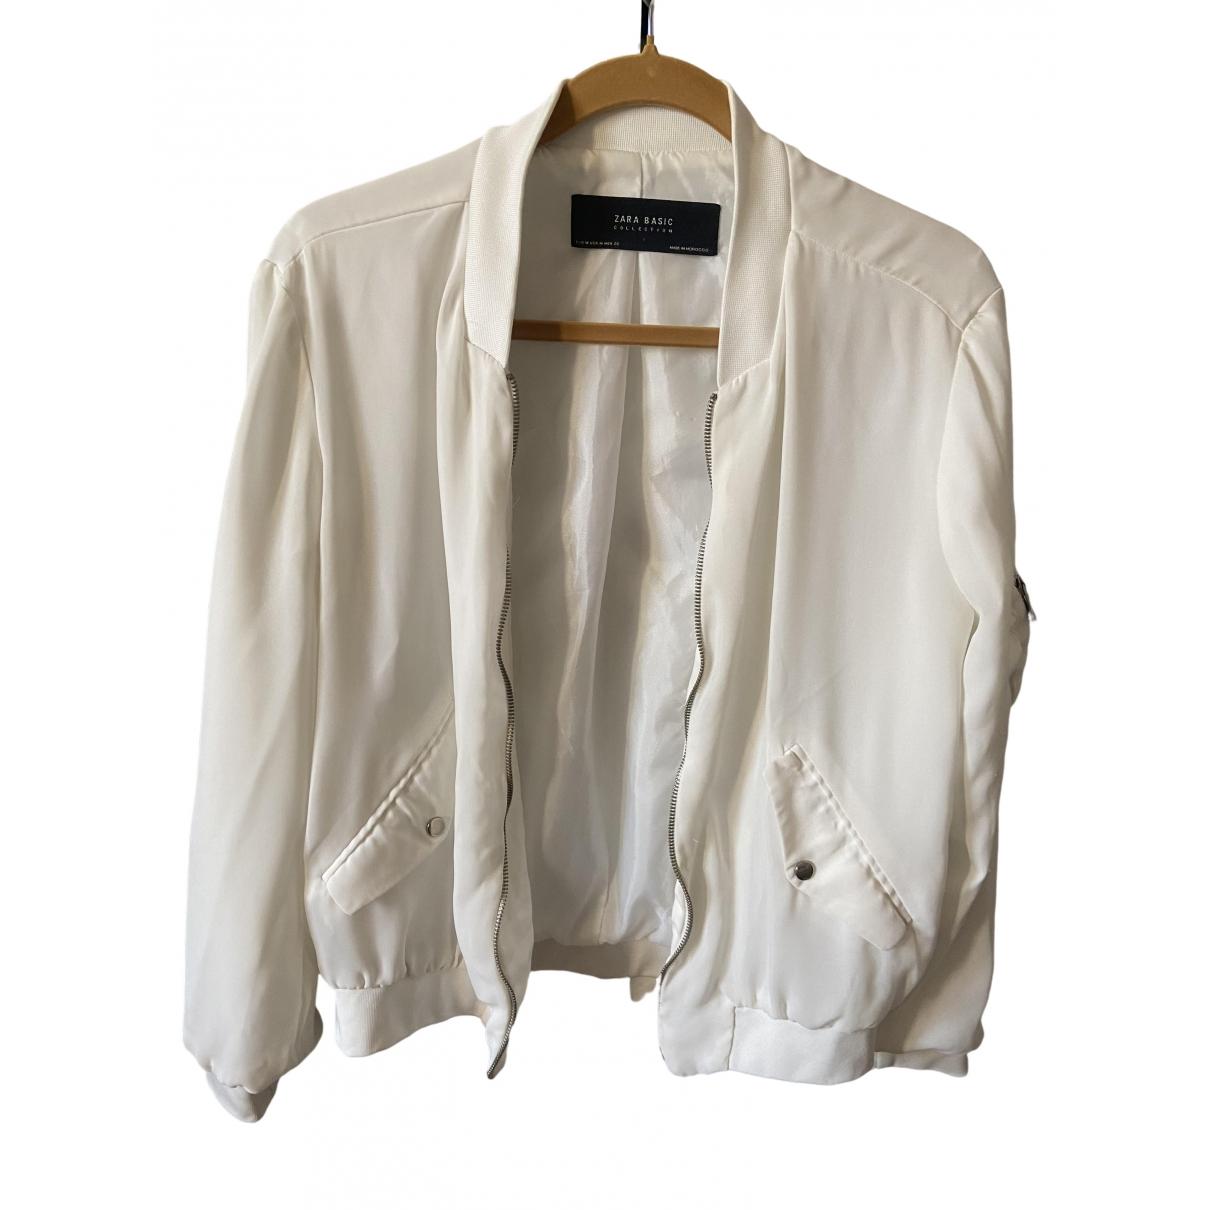 Zara \N White jacket for Women M International